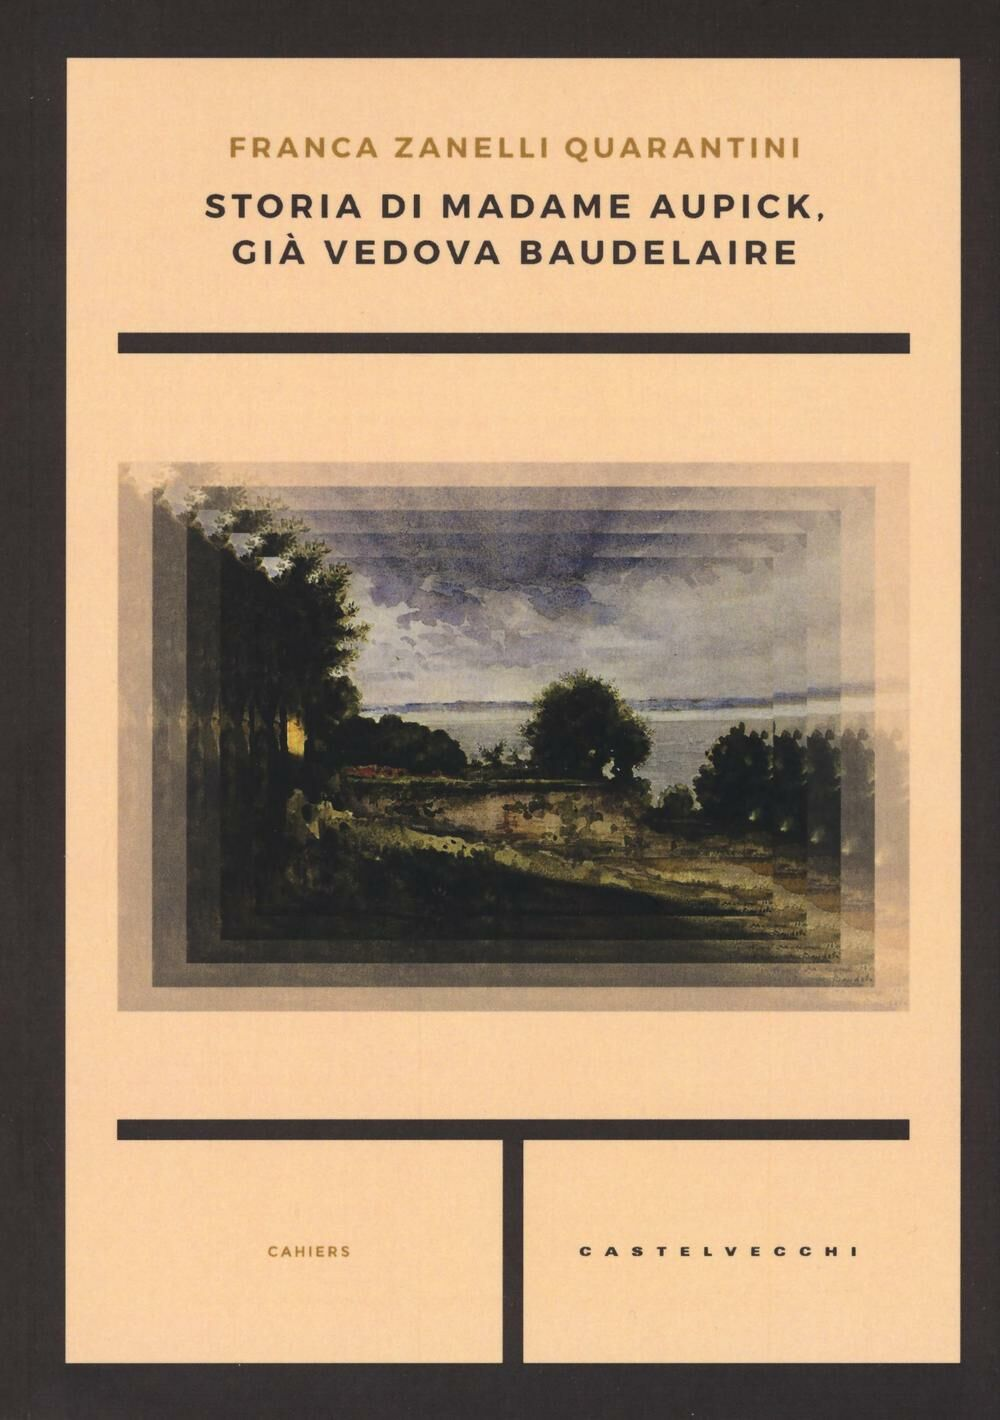 Storia di madame Aupick, già vedova Baudelaire